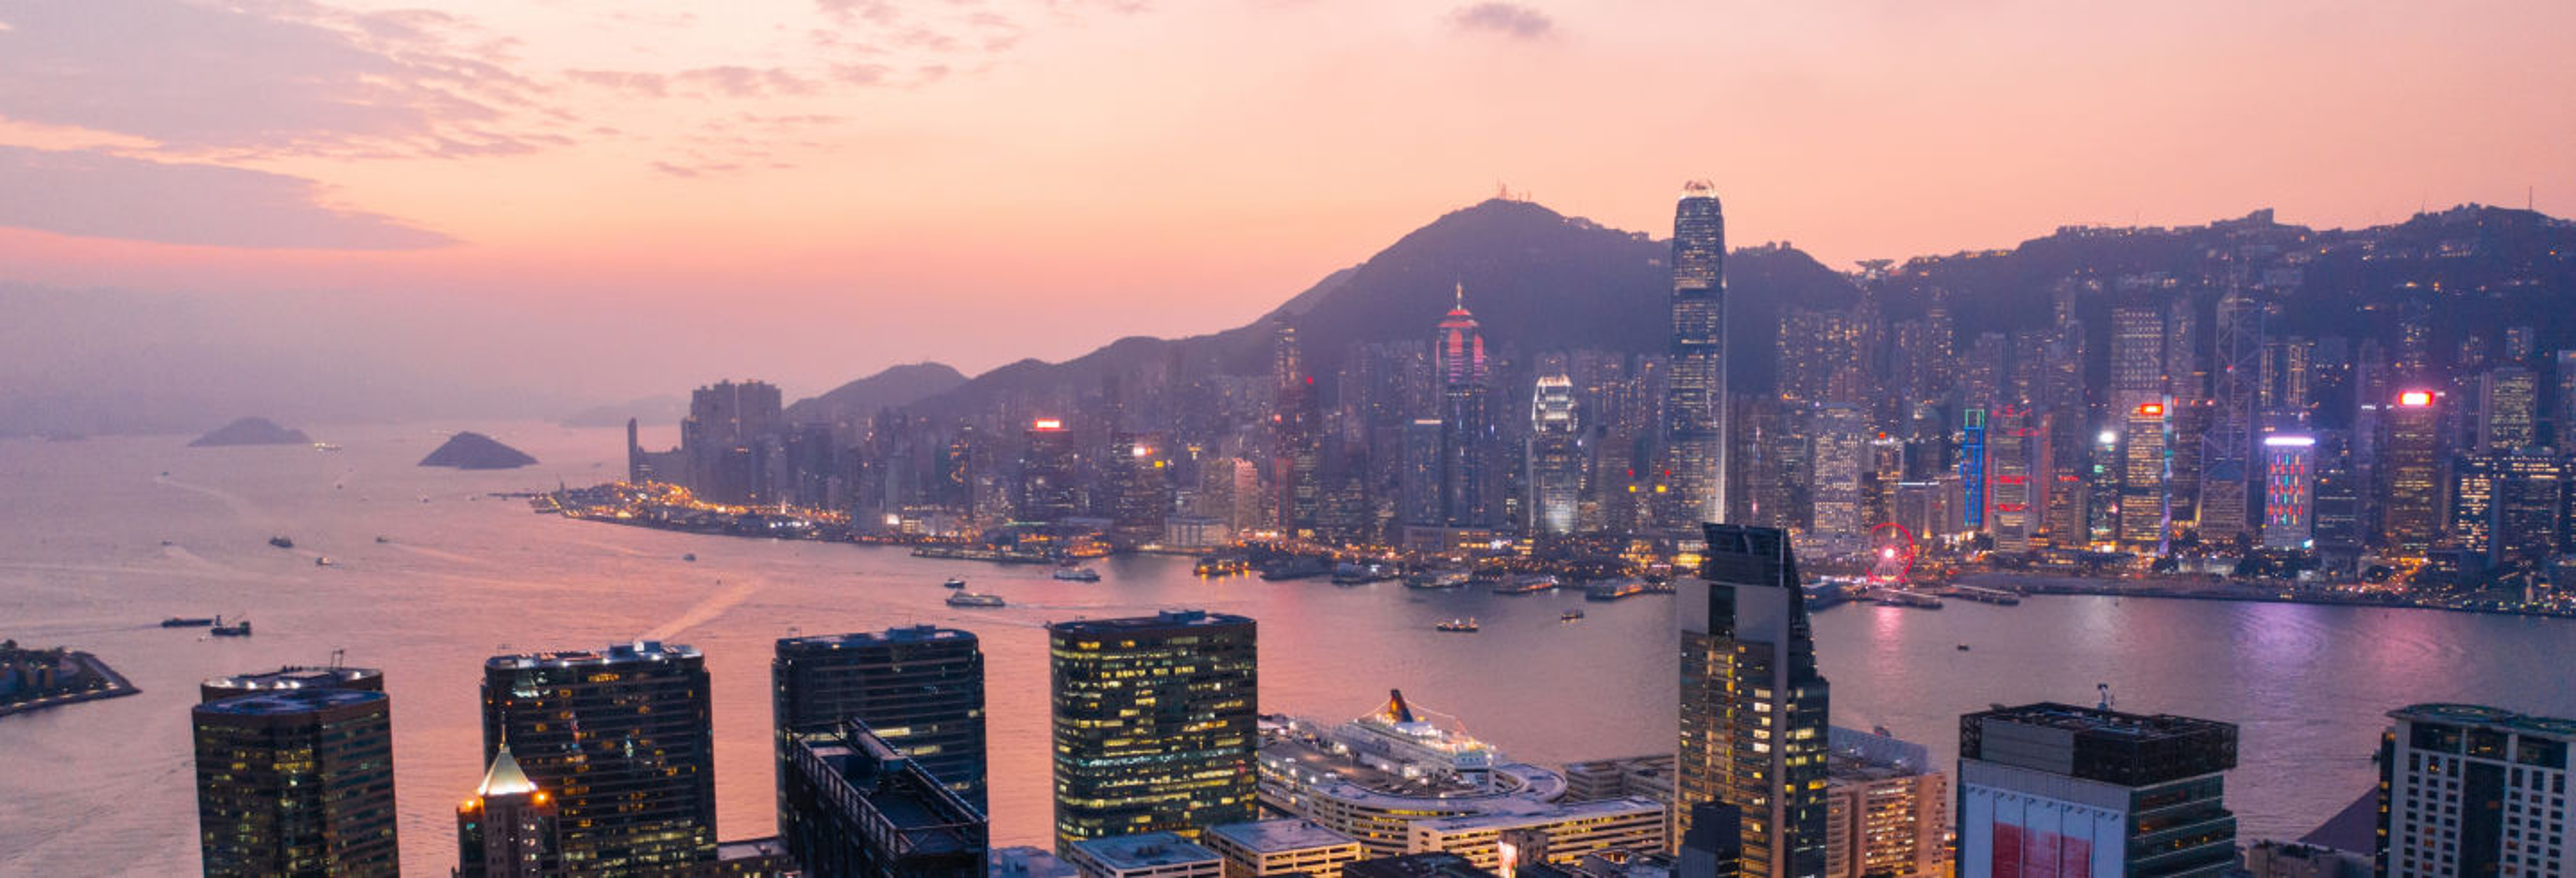 Tour privato di Hong Kong